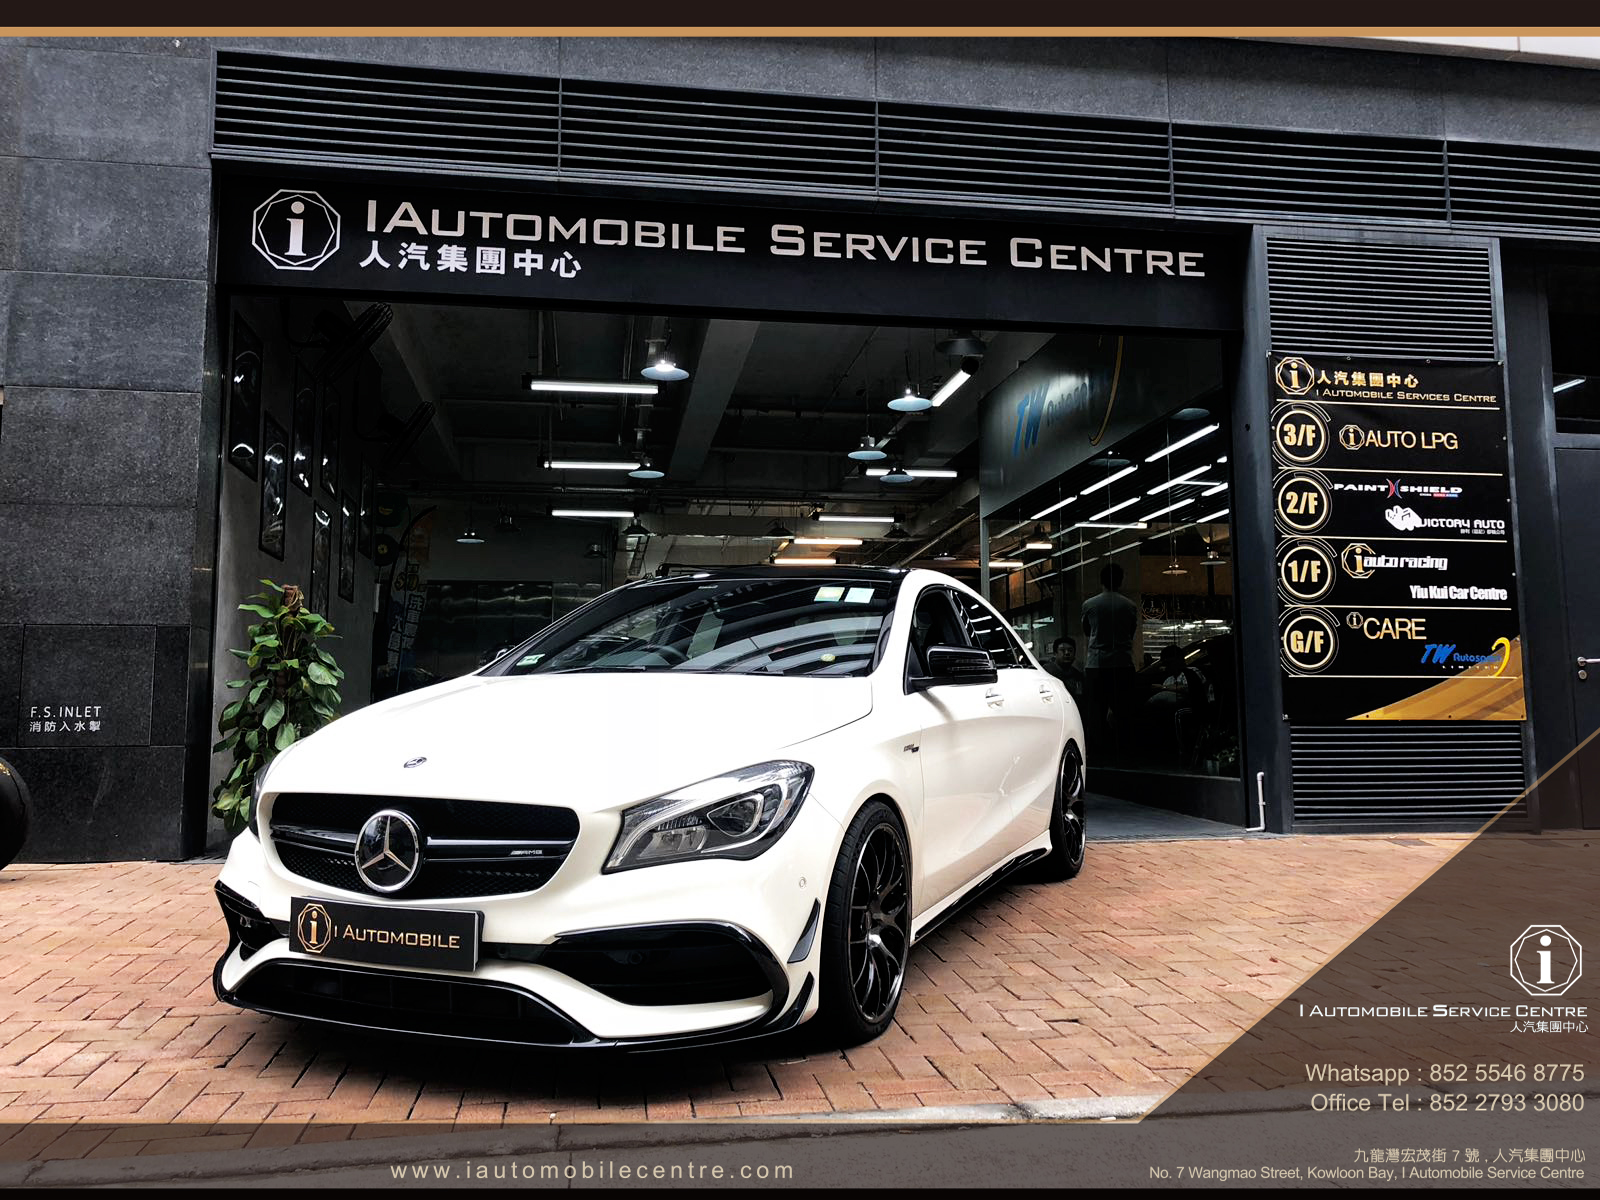 2017 Mercedes Benz CLA45